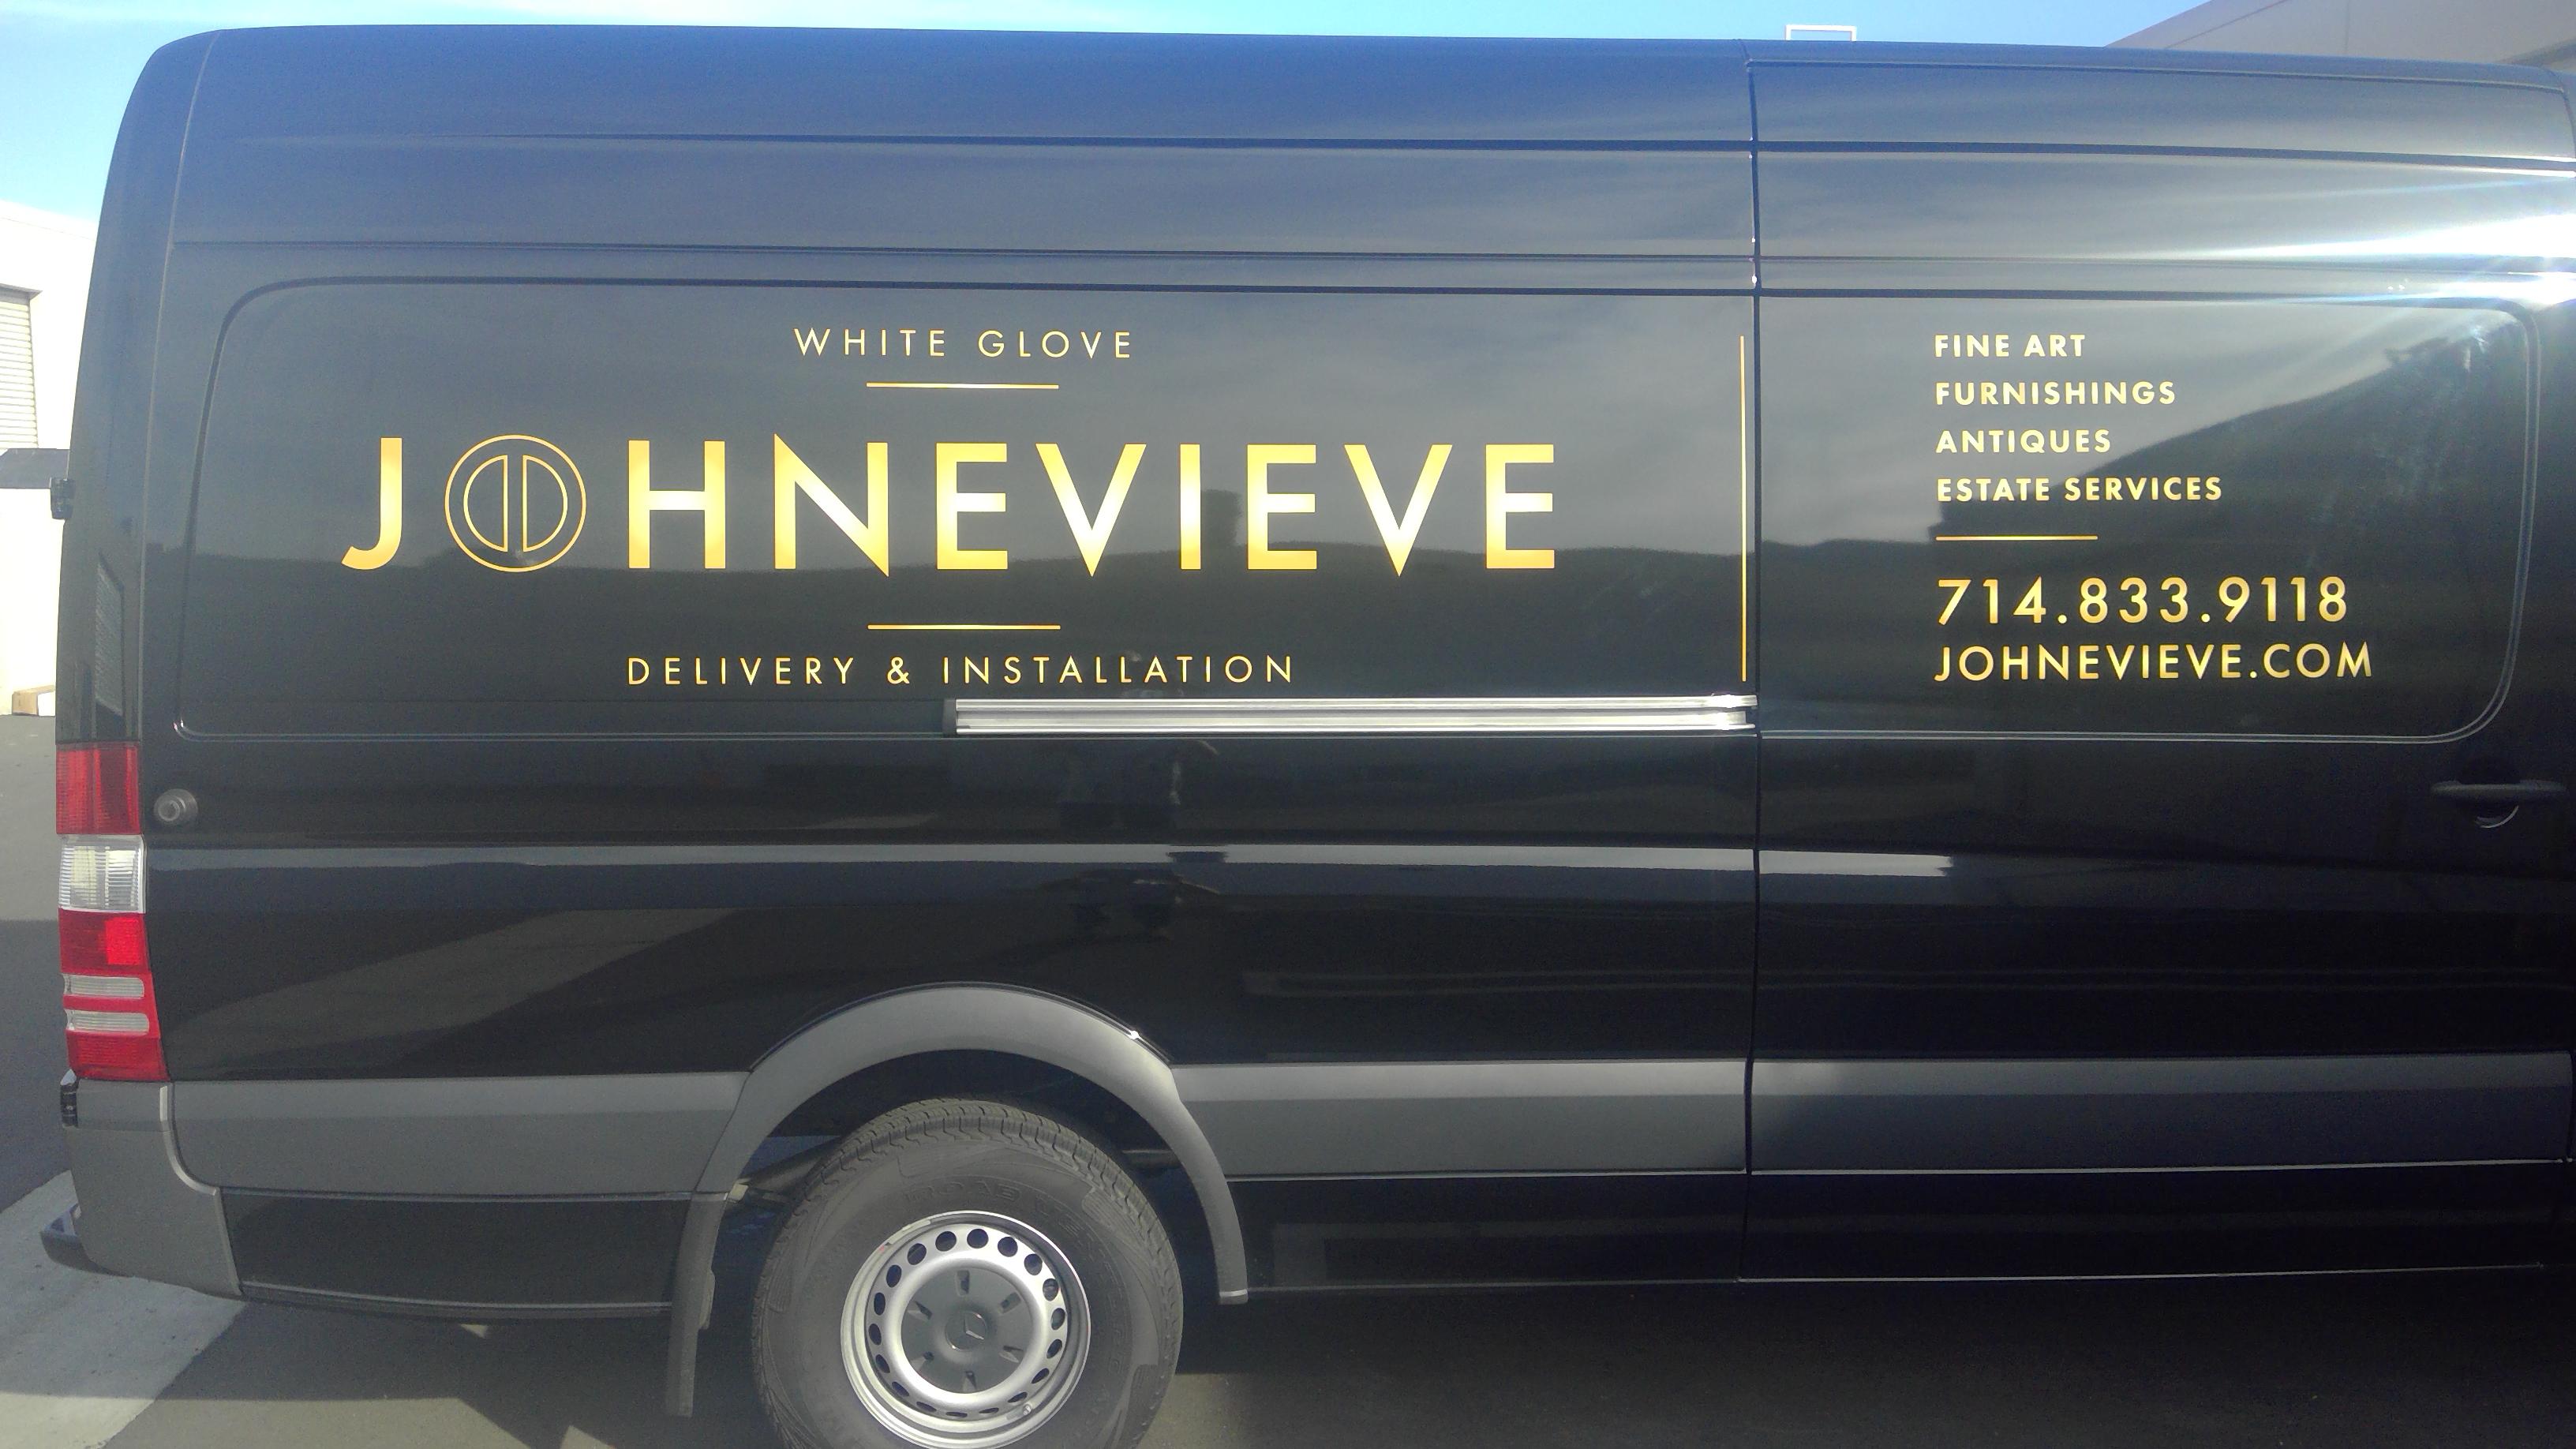 Team Sky vehicle wraps